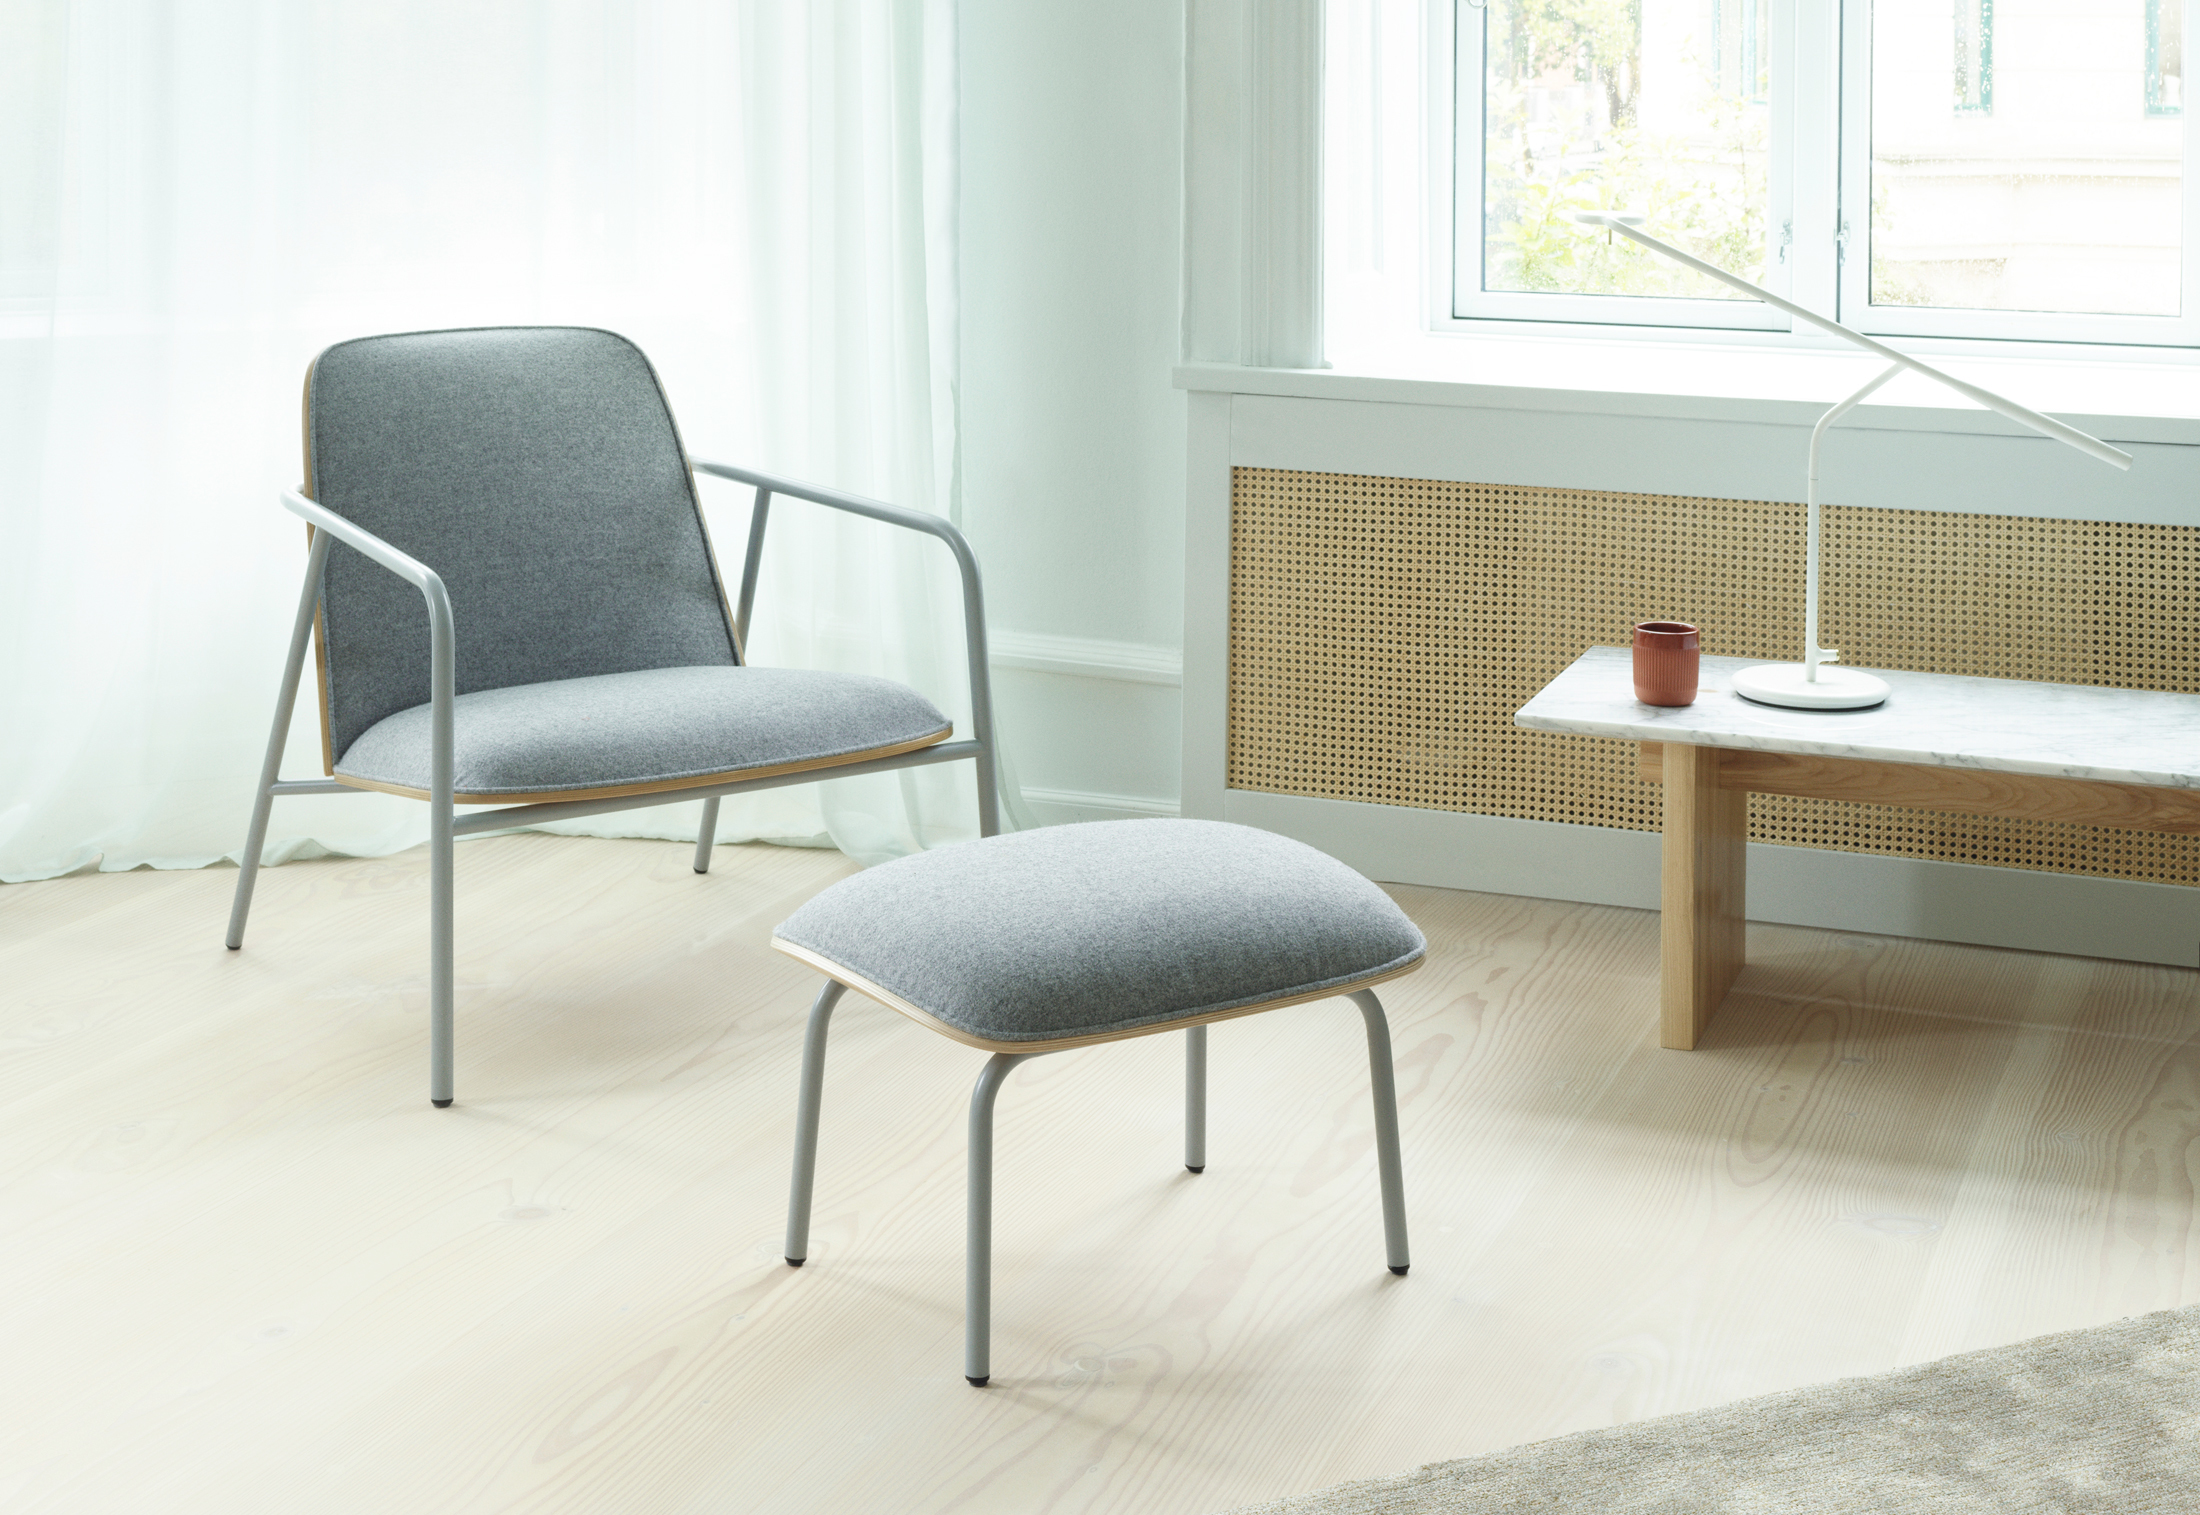 Magnificent Pad Lounge Series By Normann Copenhagen Stylepark Creativecarmelina Interior Chair Design Creativecarmelinacom